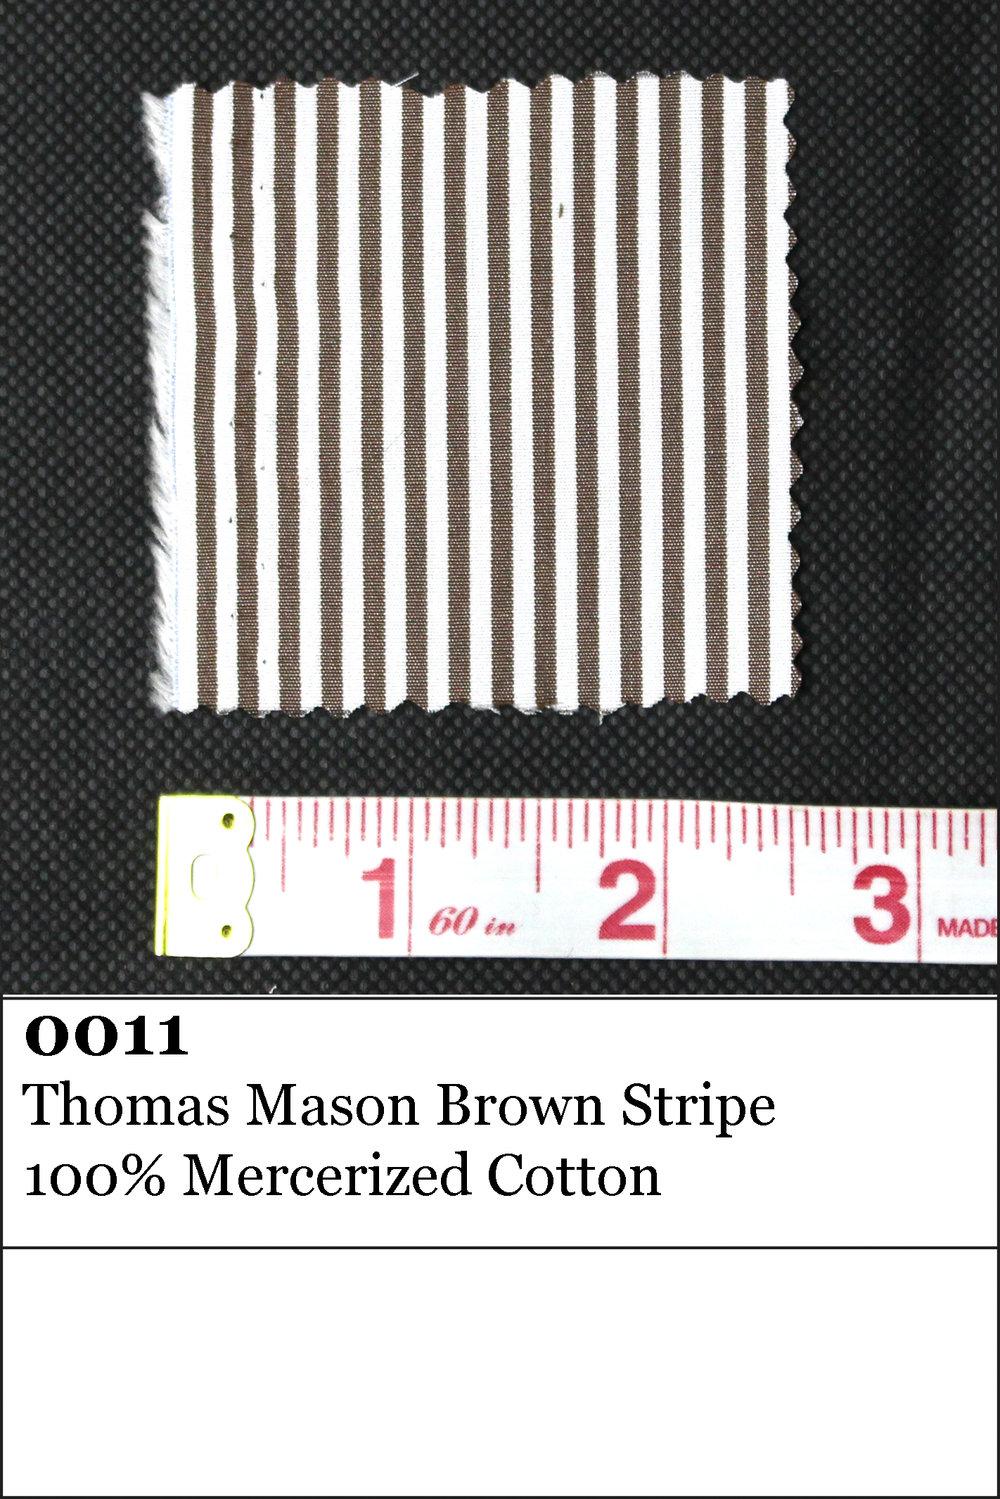 Fabric0011.jpg